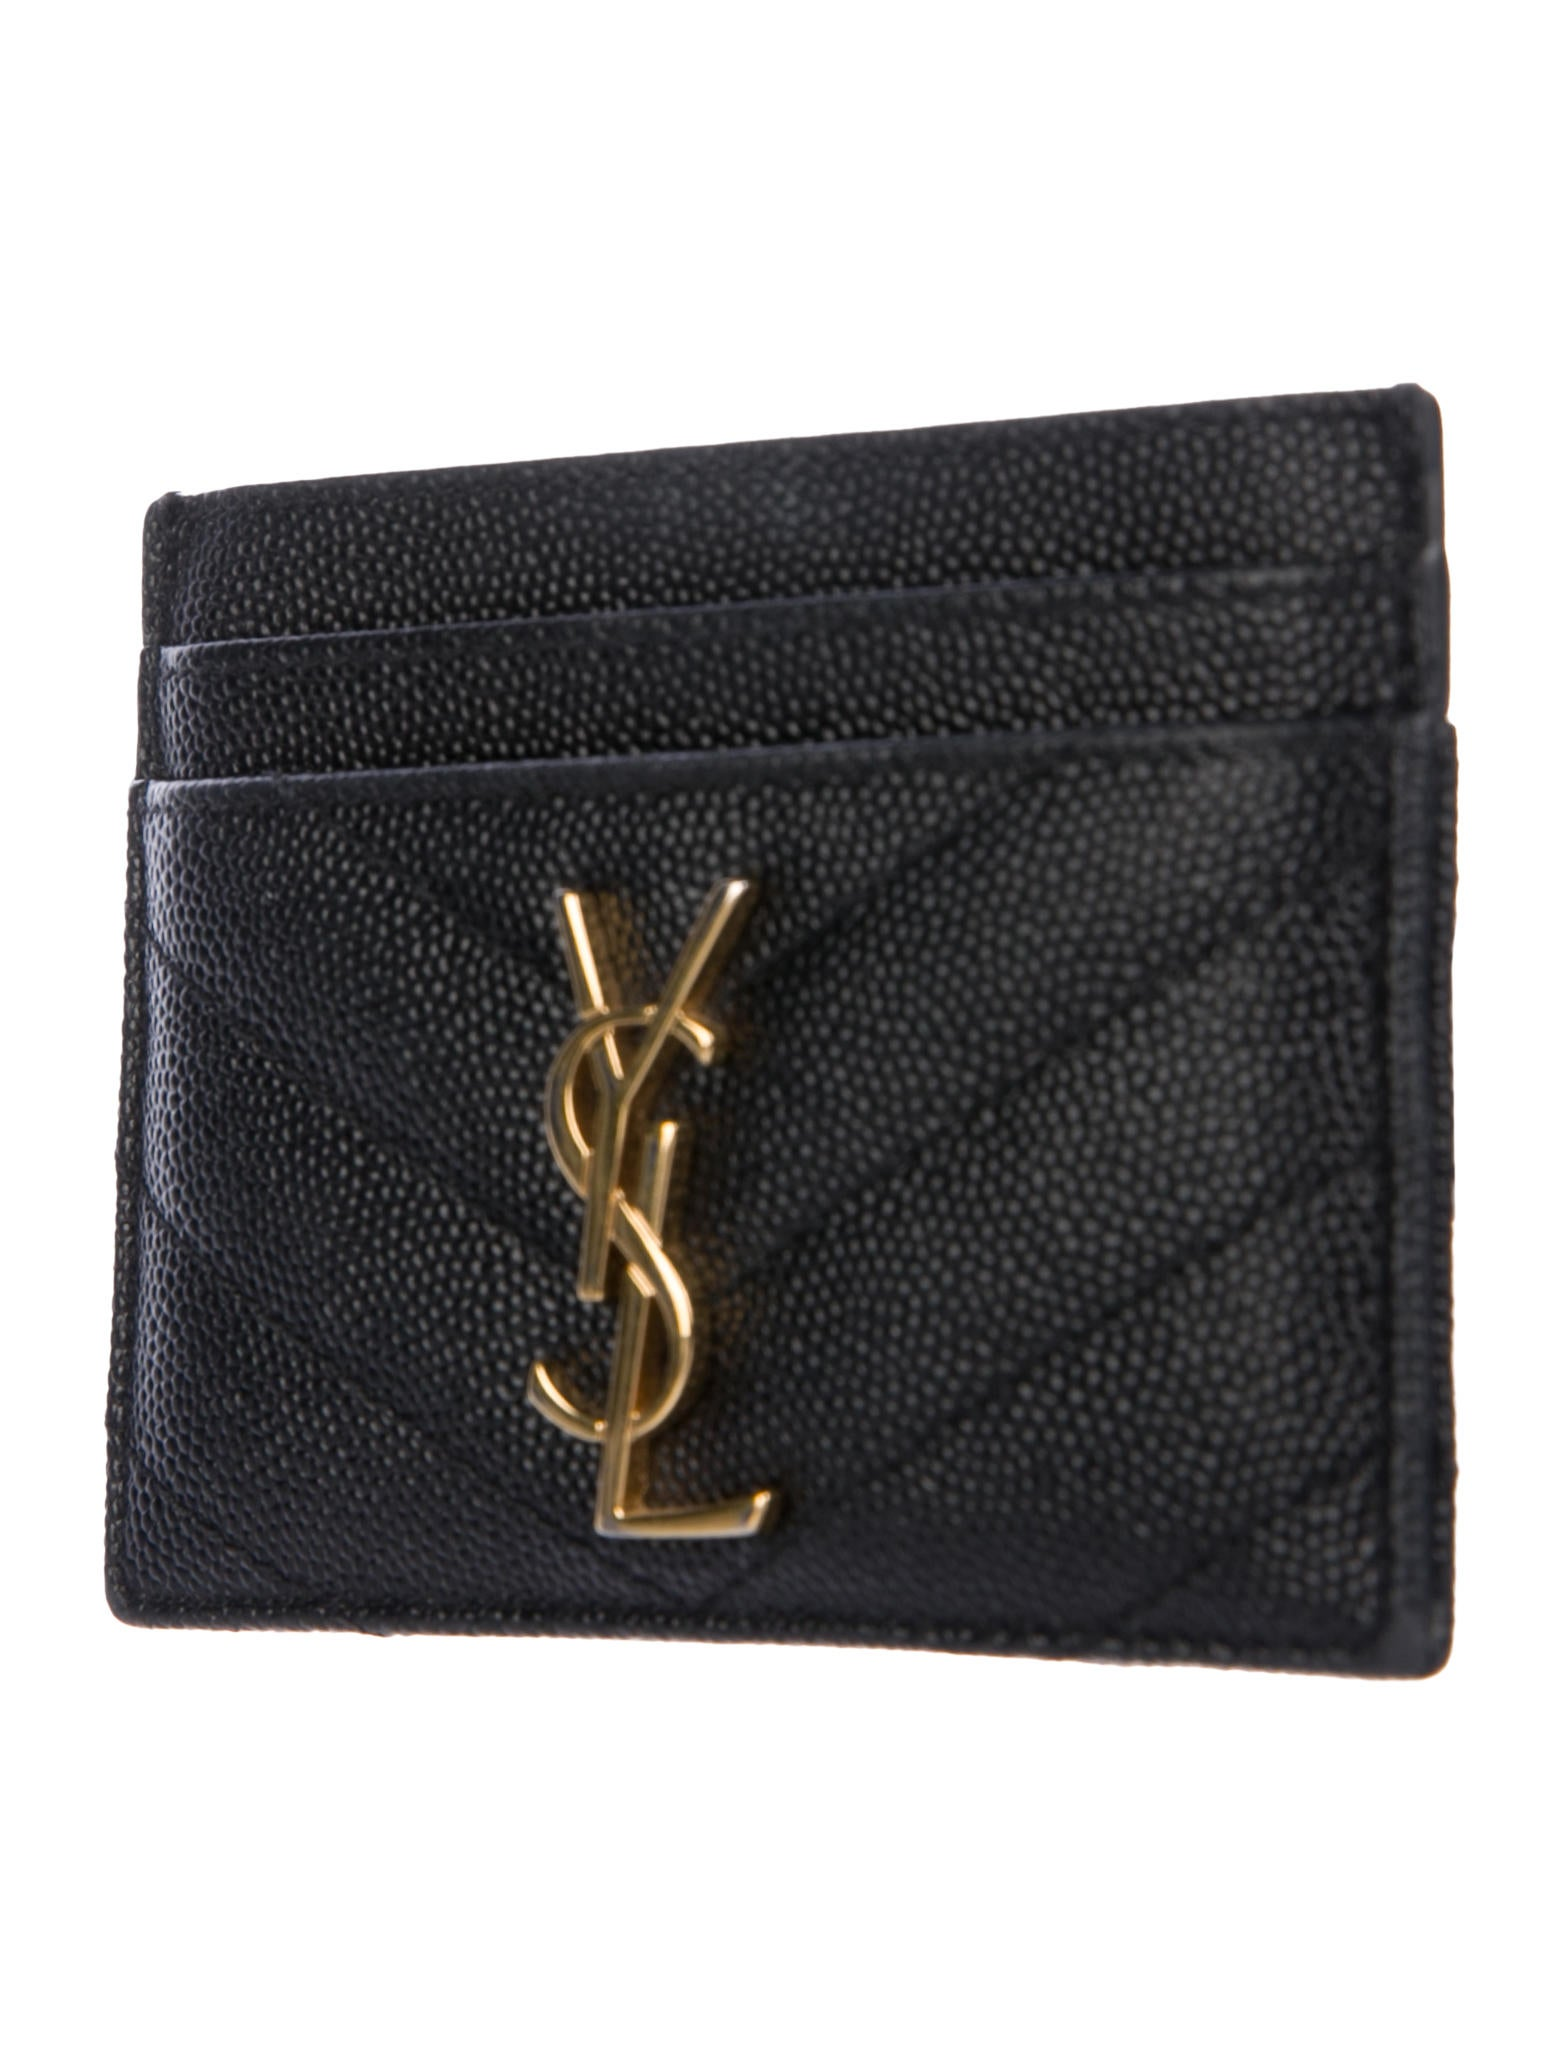 saint laurent monogram card holder wallet accessories snt49597